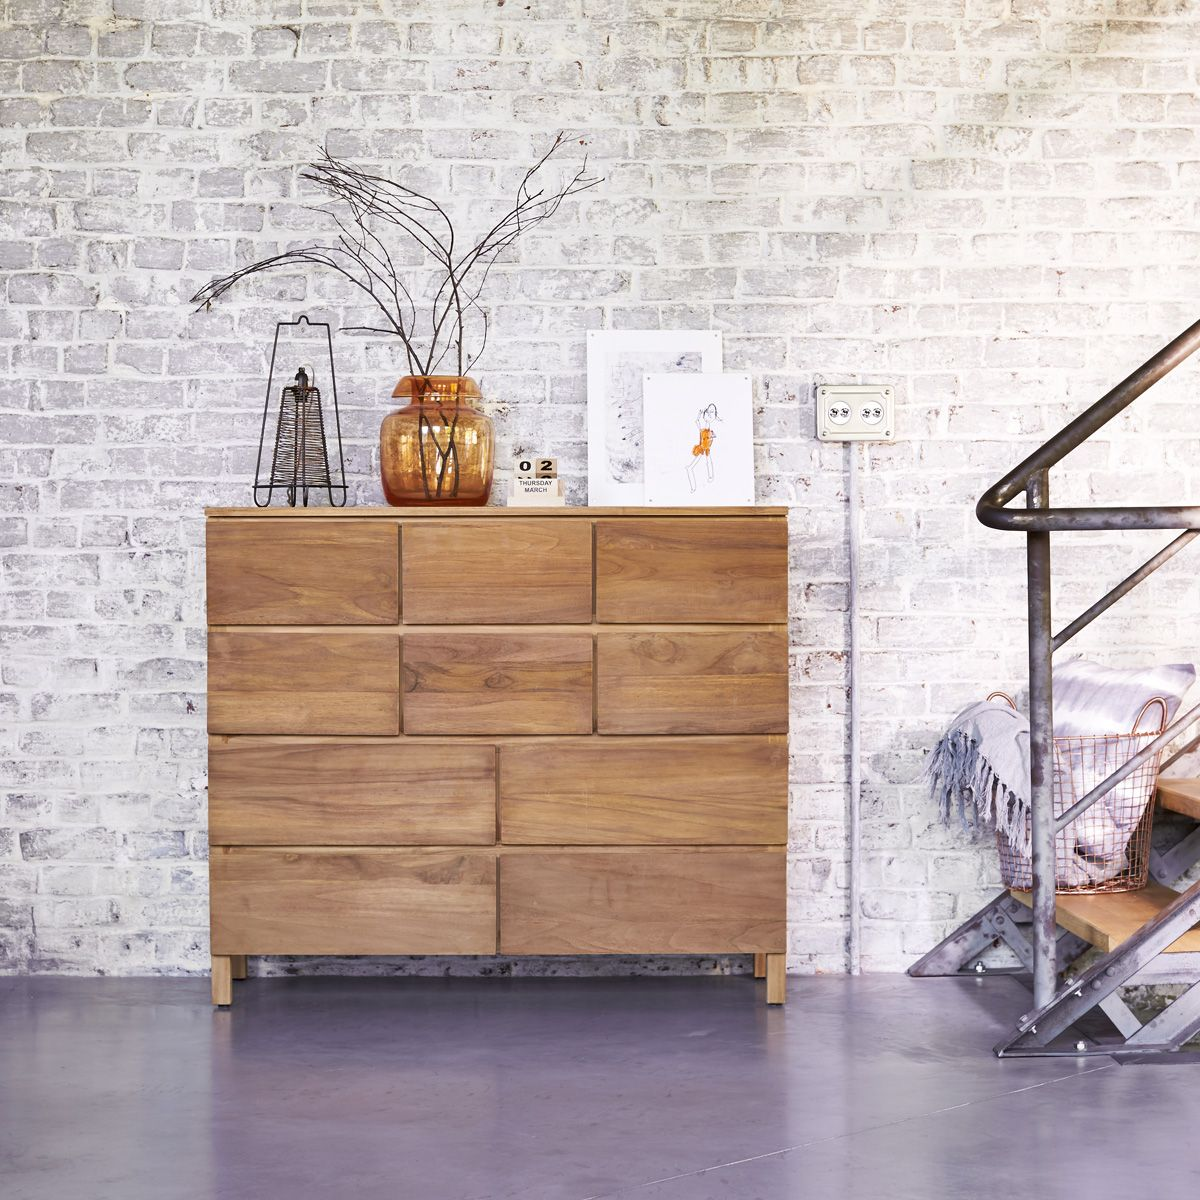 Solid Teak Wood Chest Of Drawers Sideboard Modern Design Bedroom